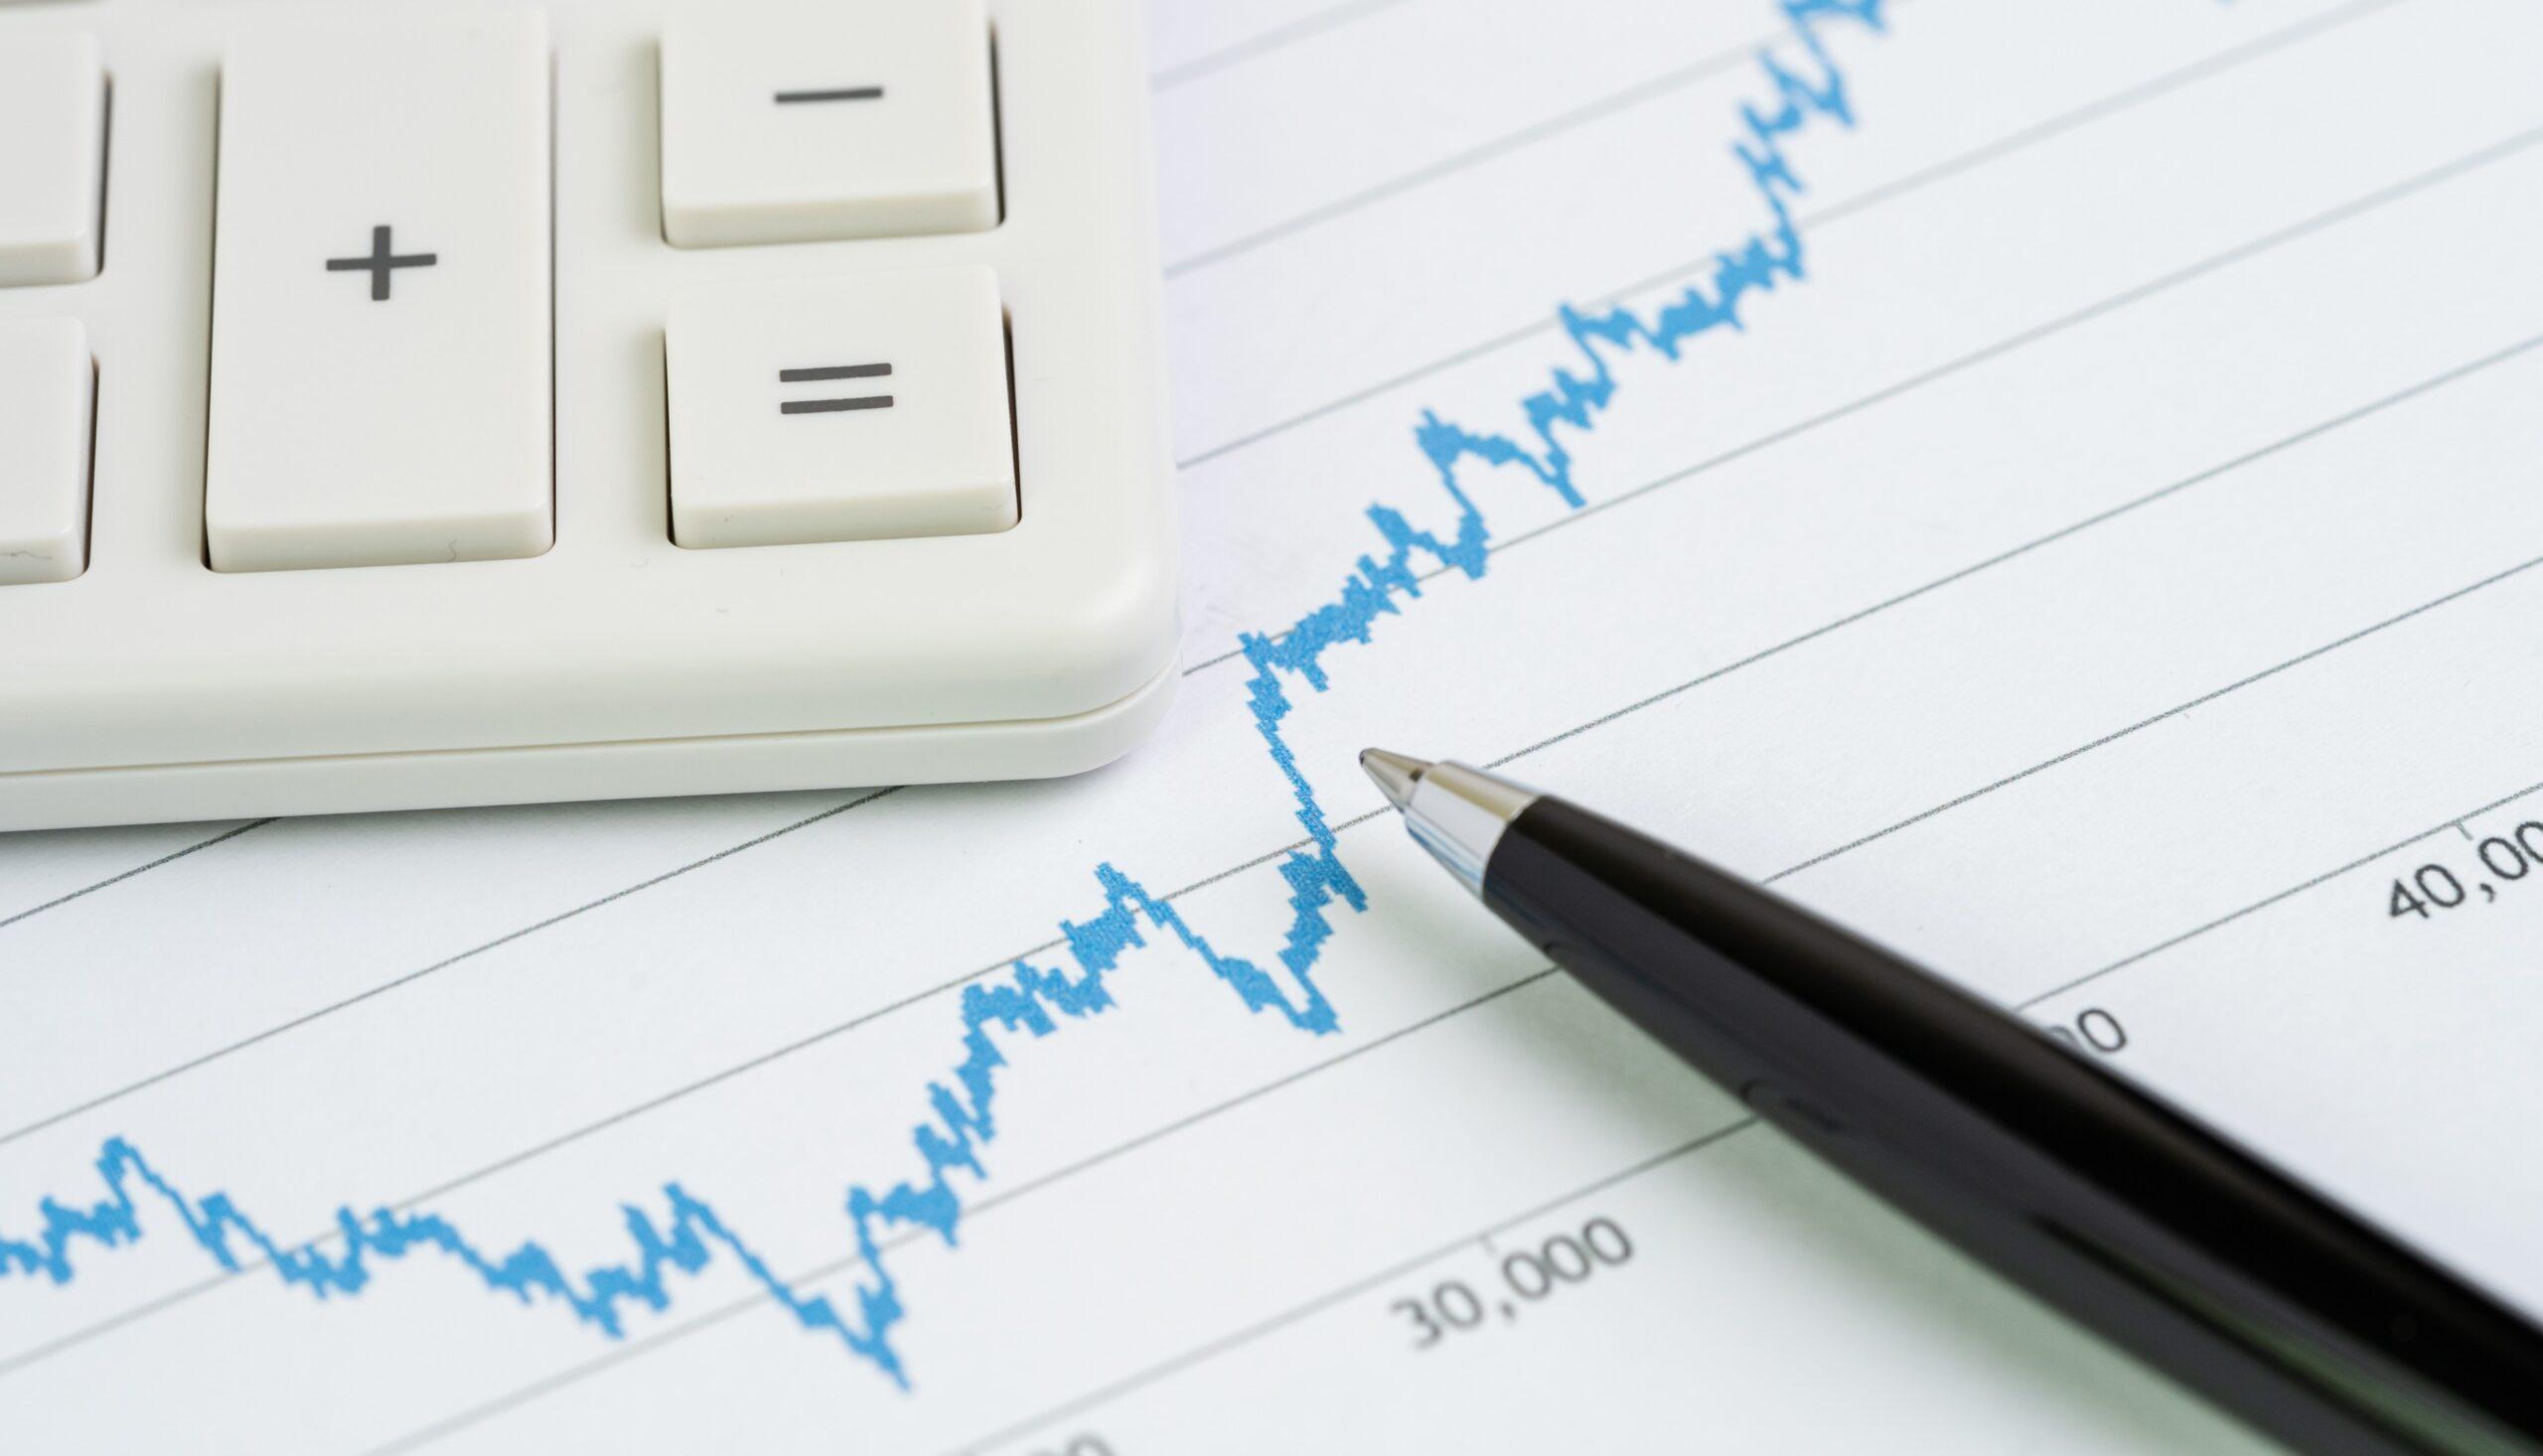 Understanding Volatility